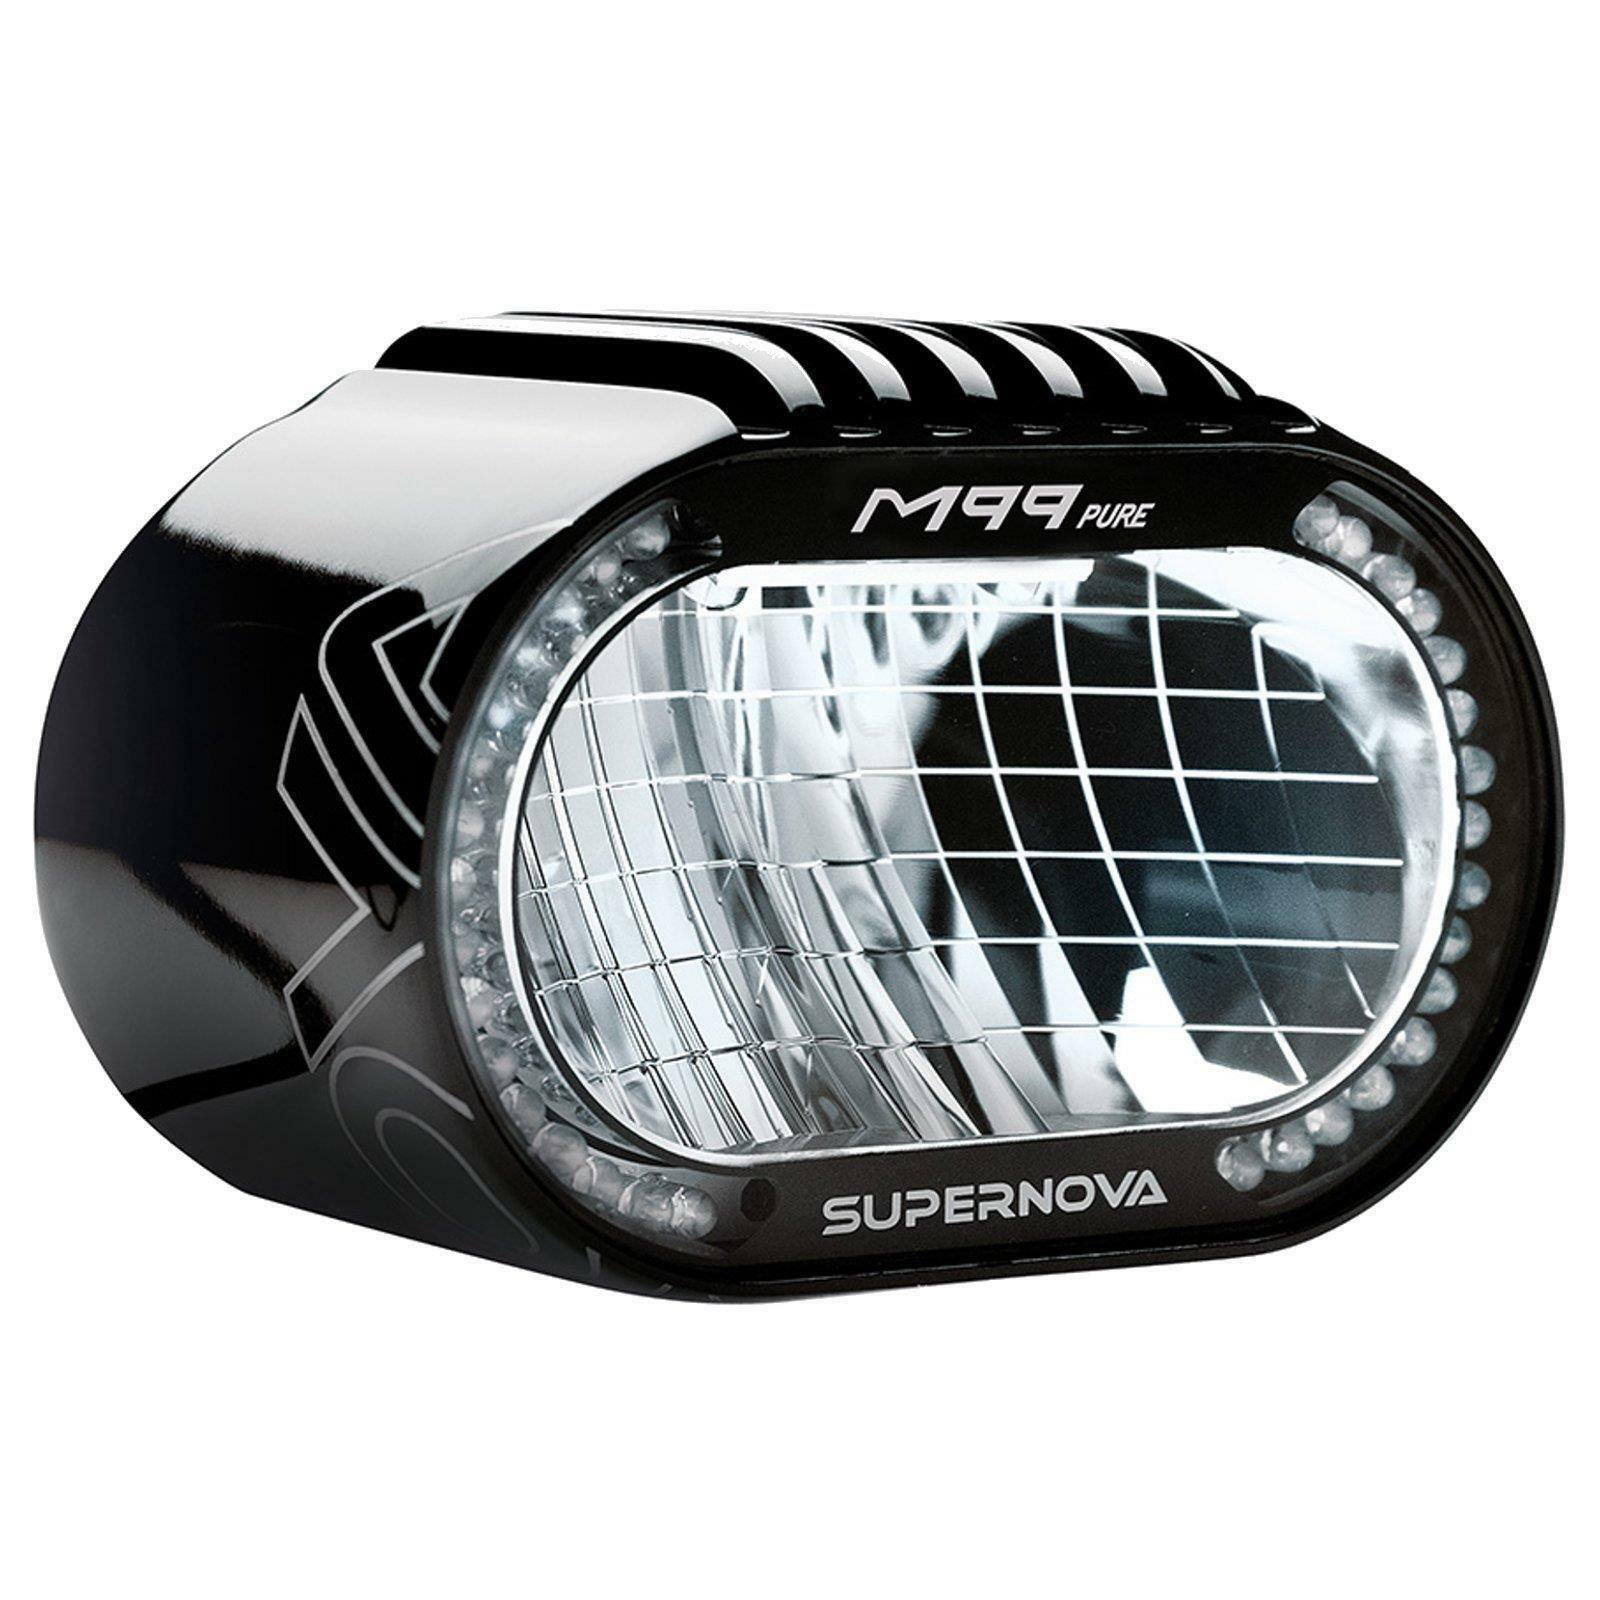 SUPERNOVA M99 Pure LED Fahrrad Scheinwerfer Tagfahr  Licht 500 Lumen E-Bike Lampe  wholesape cheap